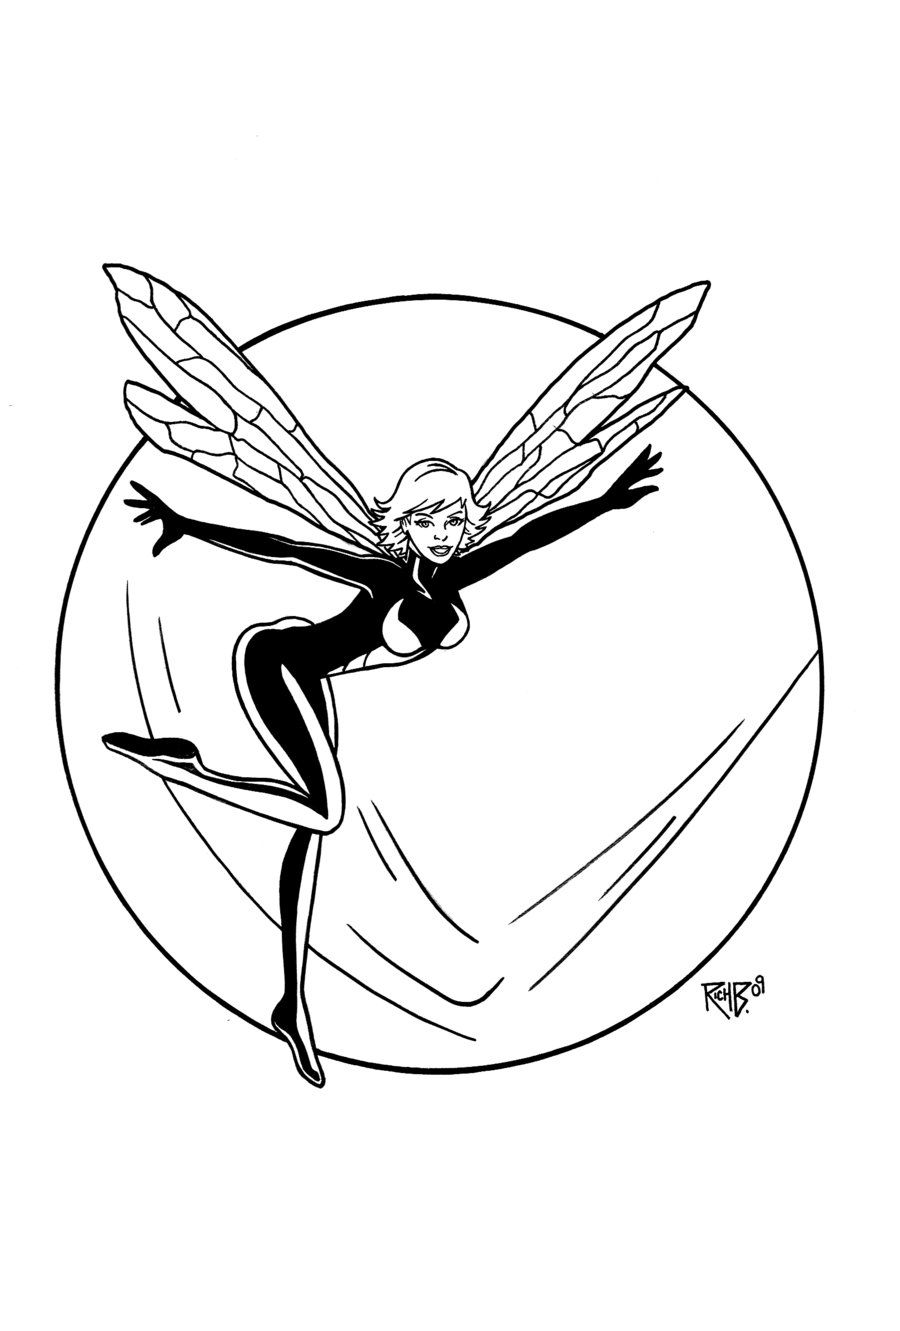 Wasp By Richbernatovech On Deviantart Wasp Marvel Marvel Comics